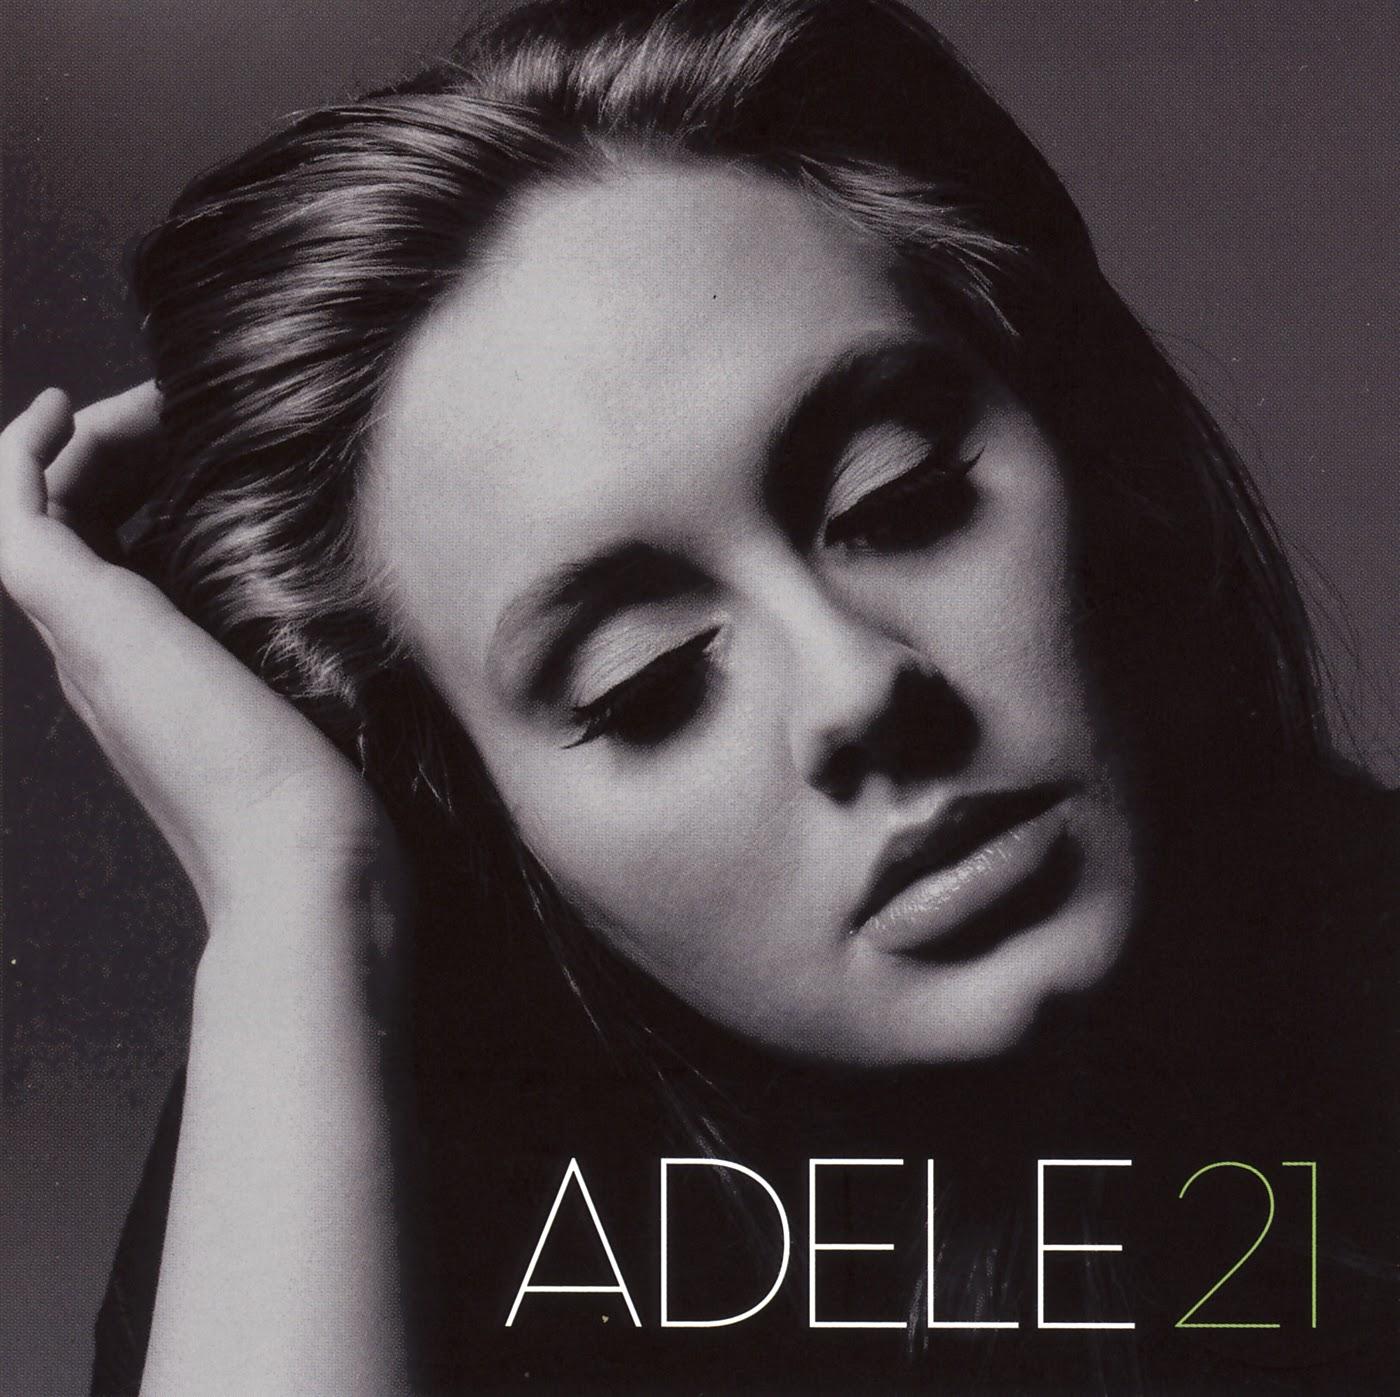 http://1.bp.blogspot.com/-icv-qpveYy8/TtgDrgHEIOI/AAAAAAAAAIY/6-m_-vm0Jyc/s1600/Adele+-+21+Front.bmp